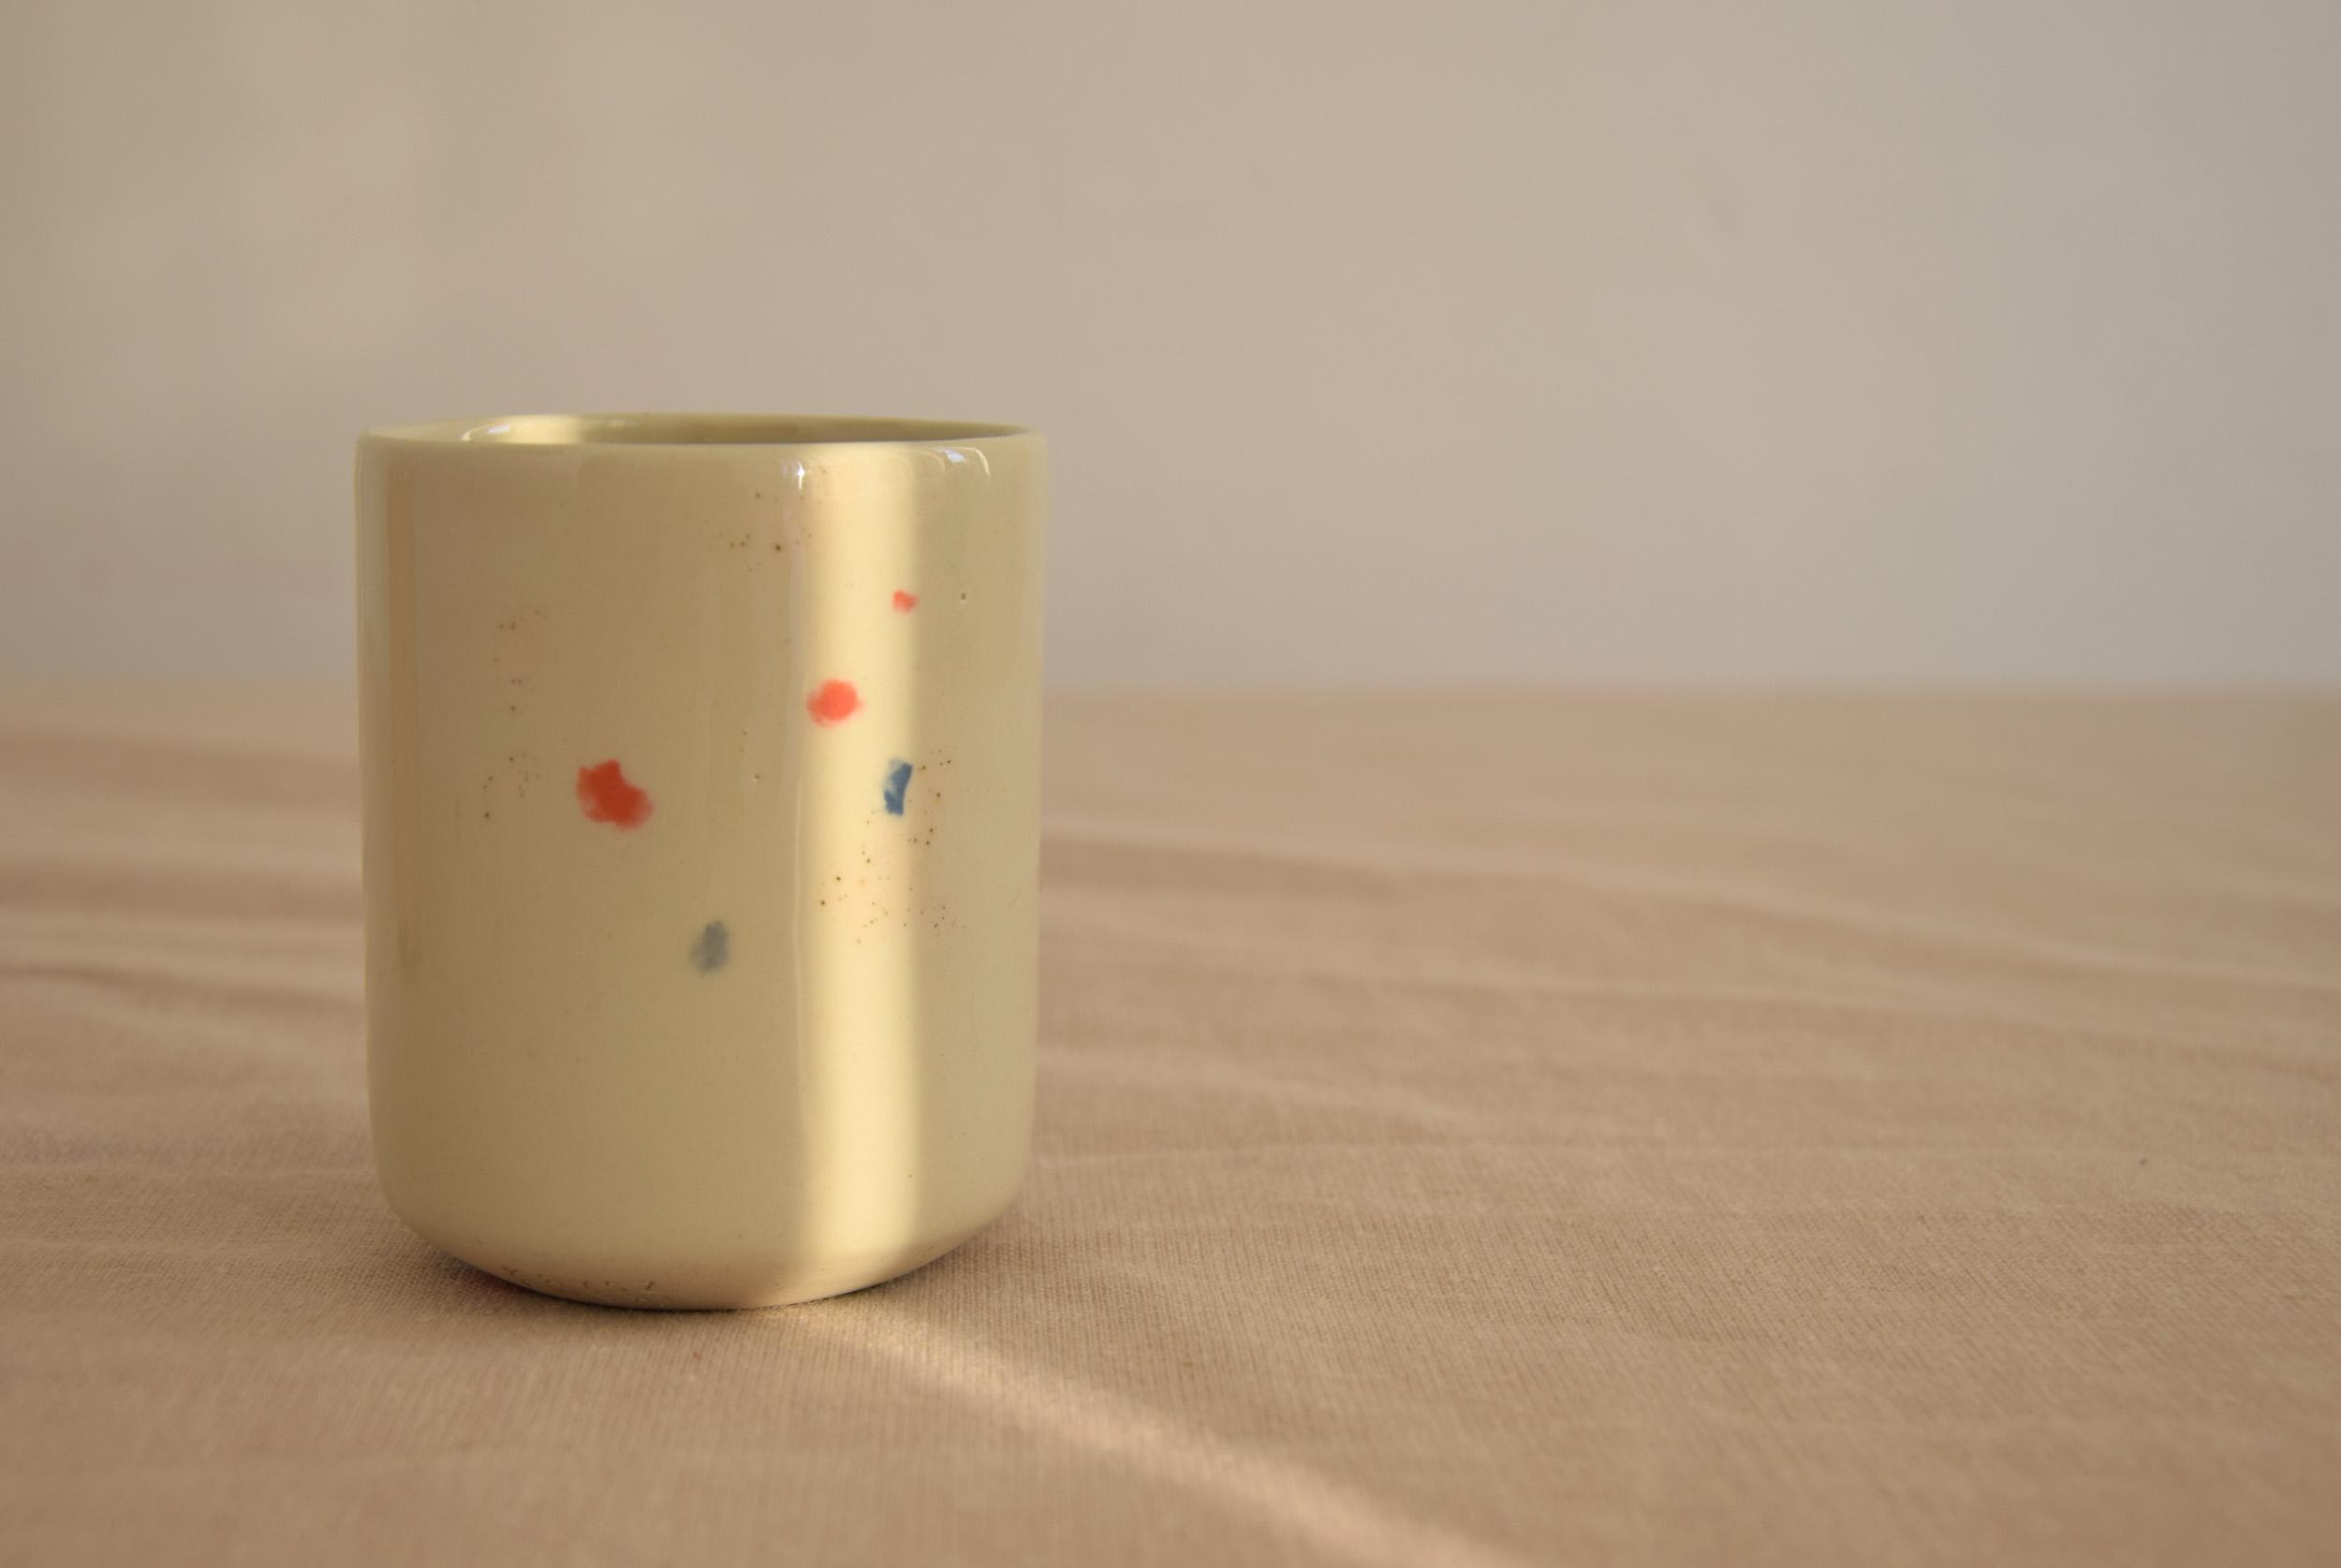 confetti4-studiokryszewski.jpg